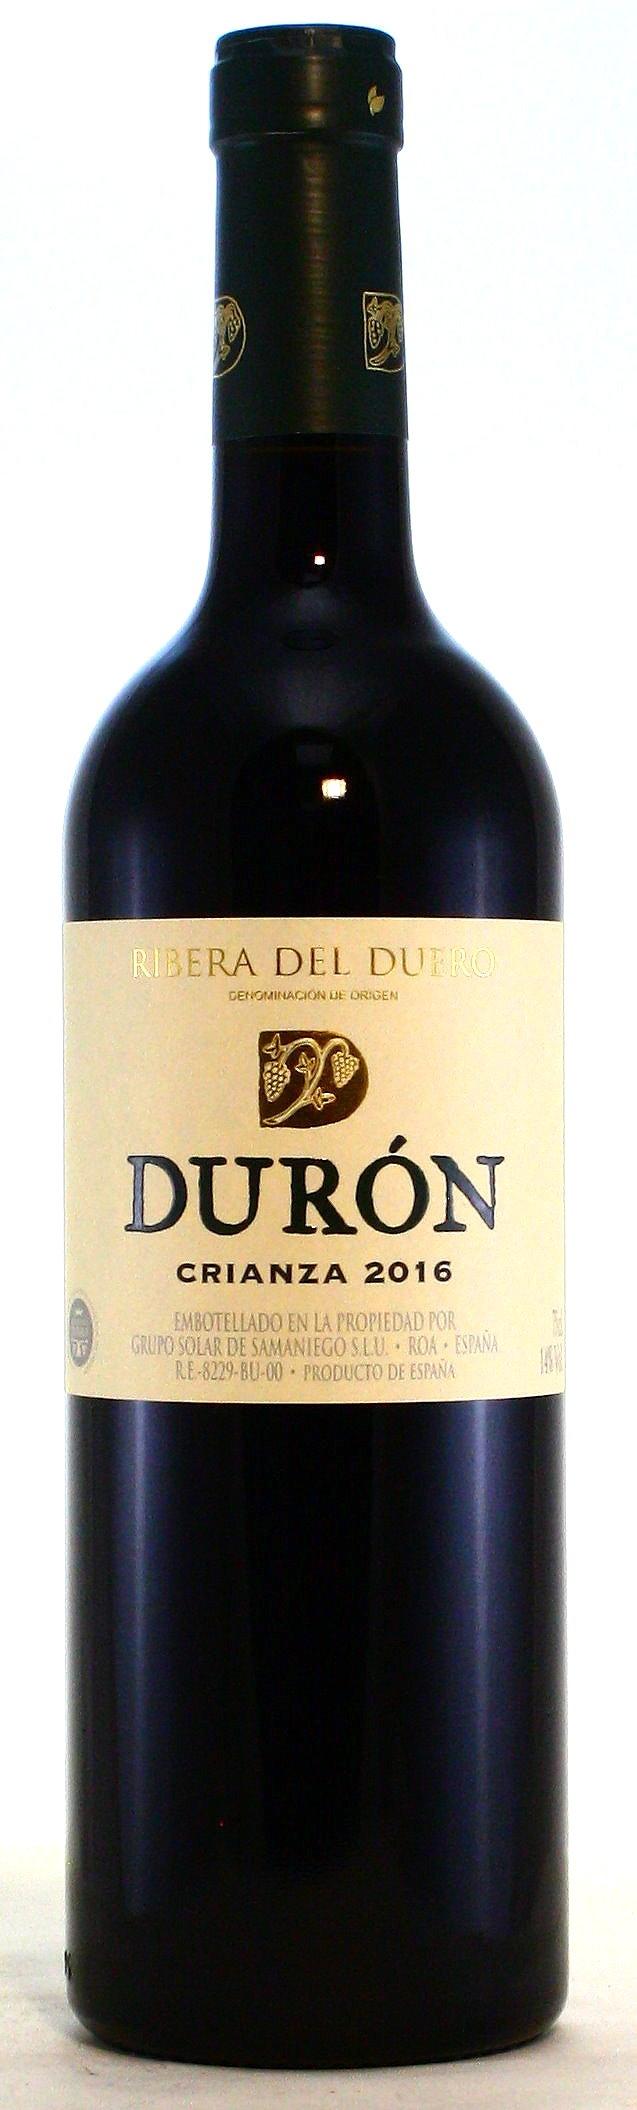 Duron Ribera del Duero Crianza, Bodegas Duron - Solar de Samaniego